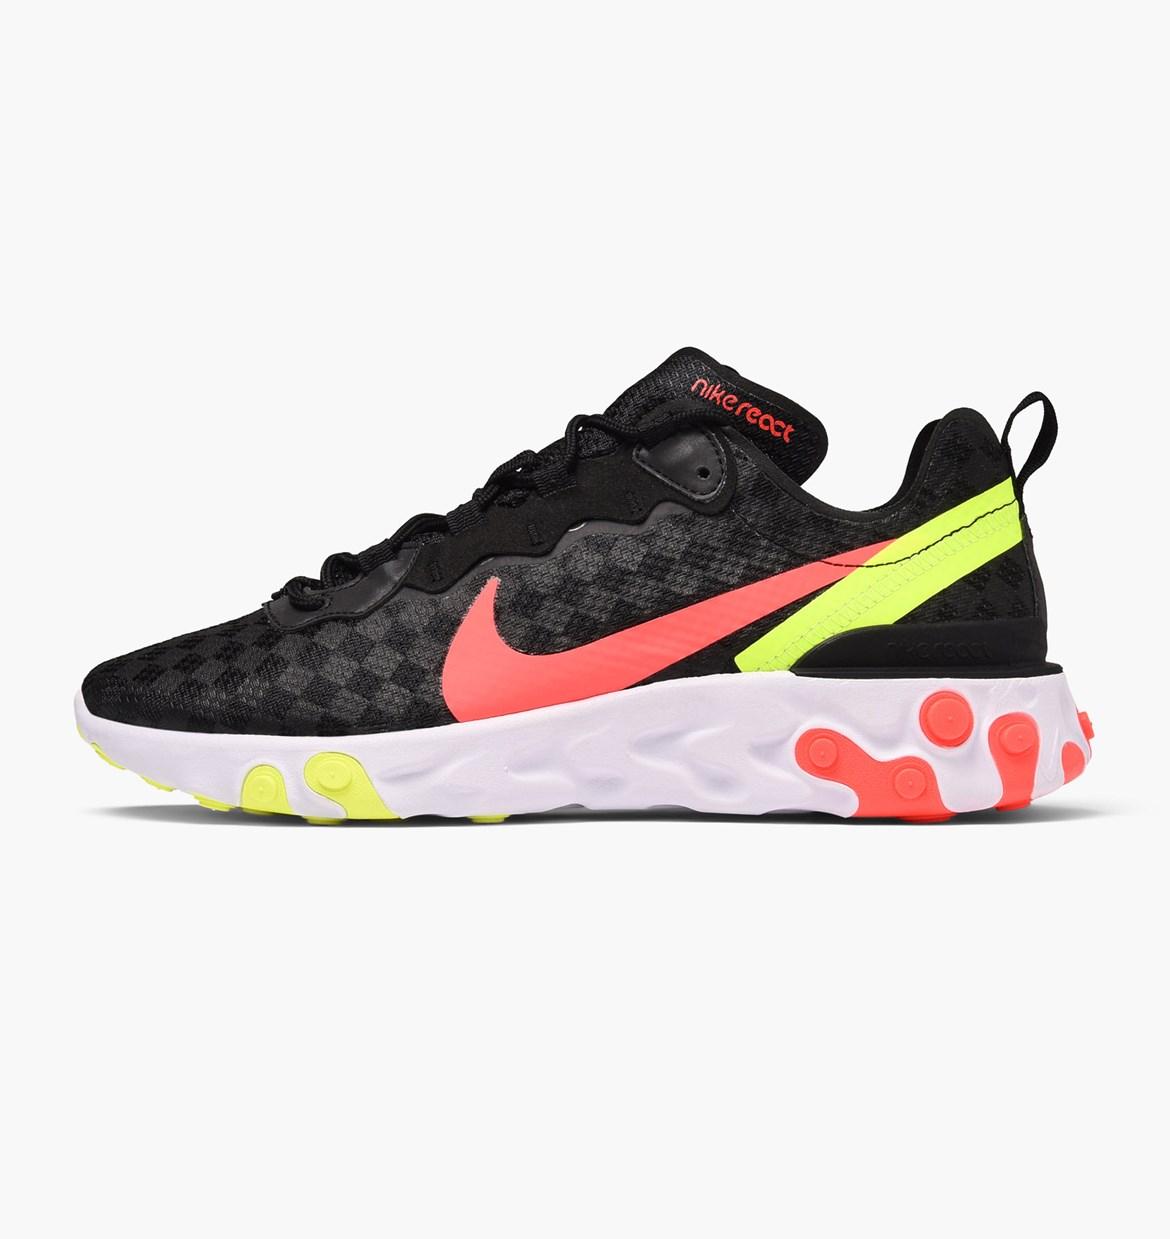 30% Rabatt auf nahezu alles bei Animal Tracks (Sale inkl.), z.B. Nike React Element 55 BLACK/FLASH CRIMSON (Gr. 37-44,5)